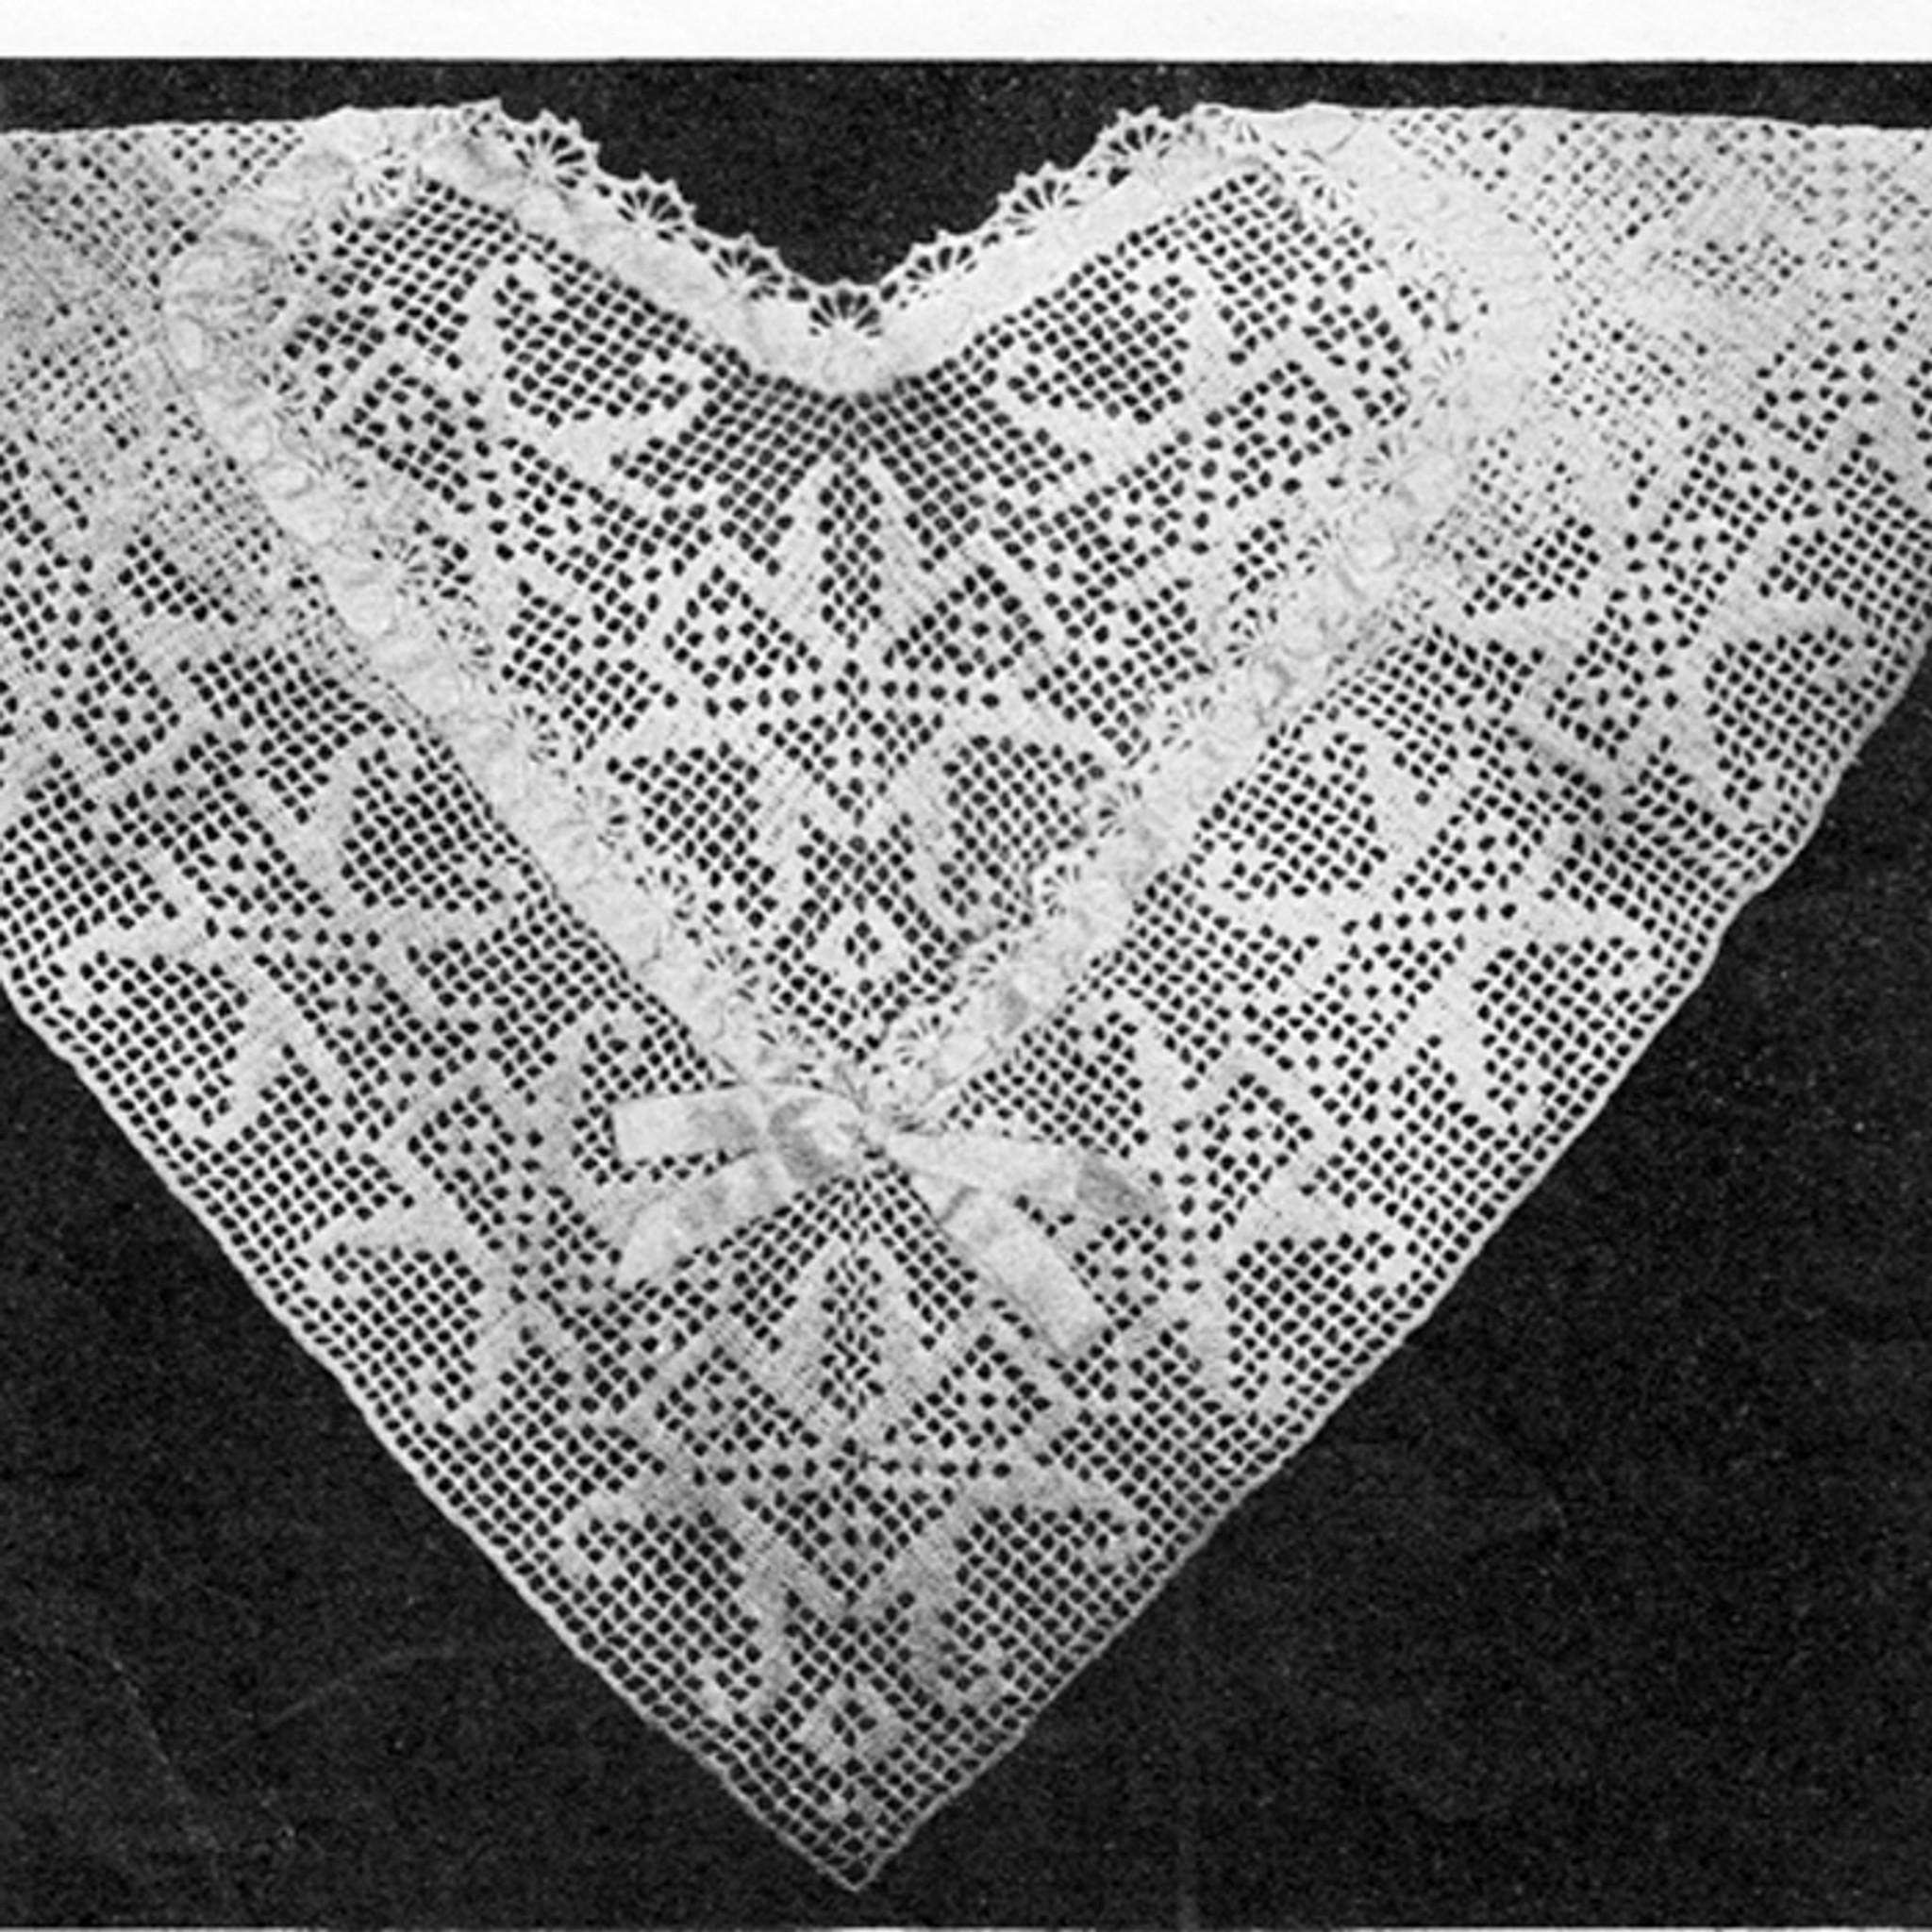 Filet Crochet Square Yoke Collar Pattern Vintage 1920s